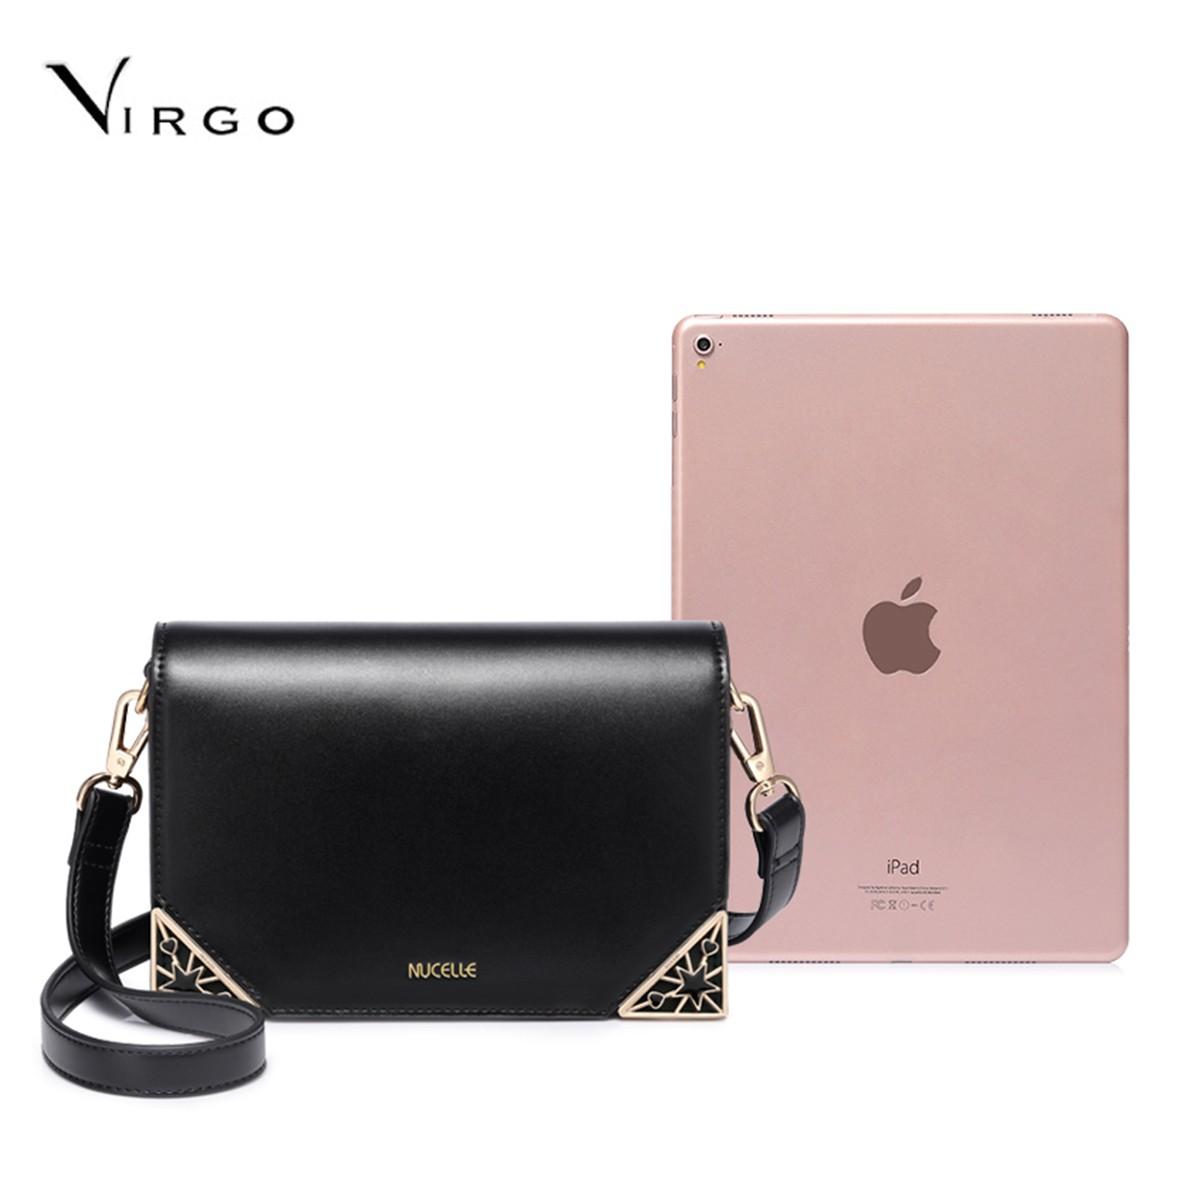 Túi xách nữ thời trang Nucelle Virgo VG429